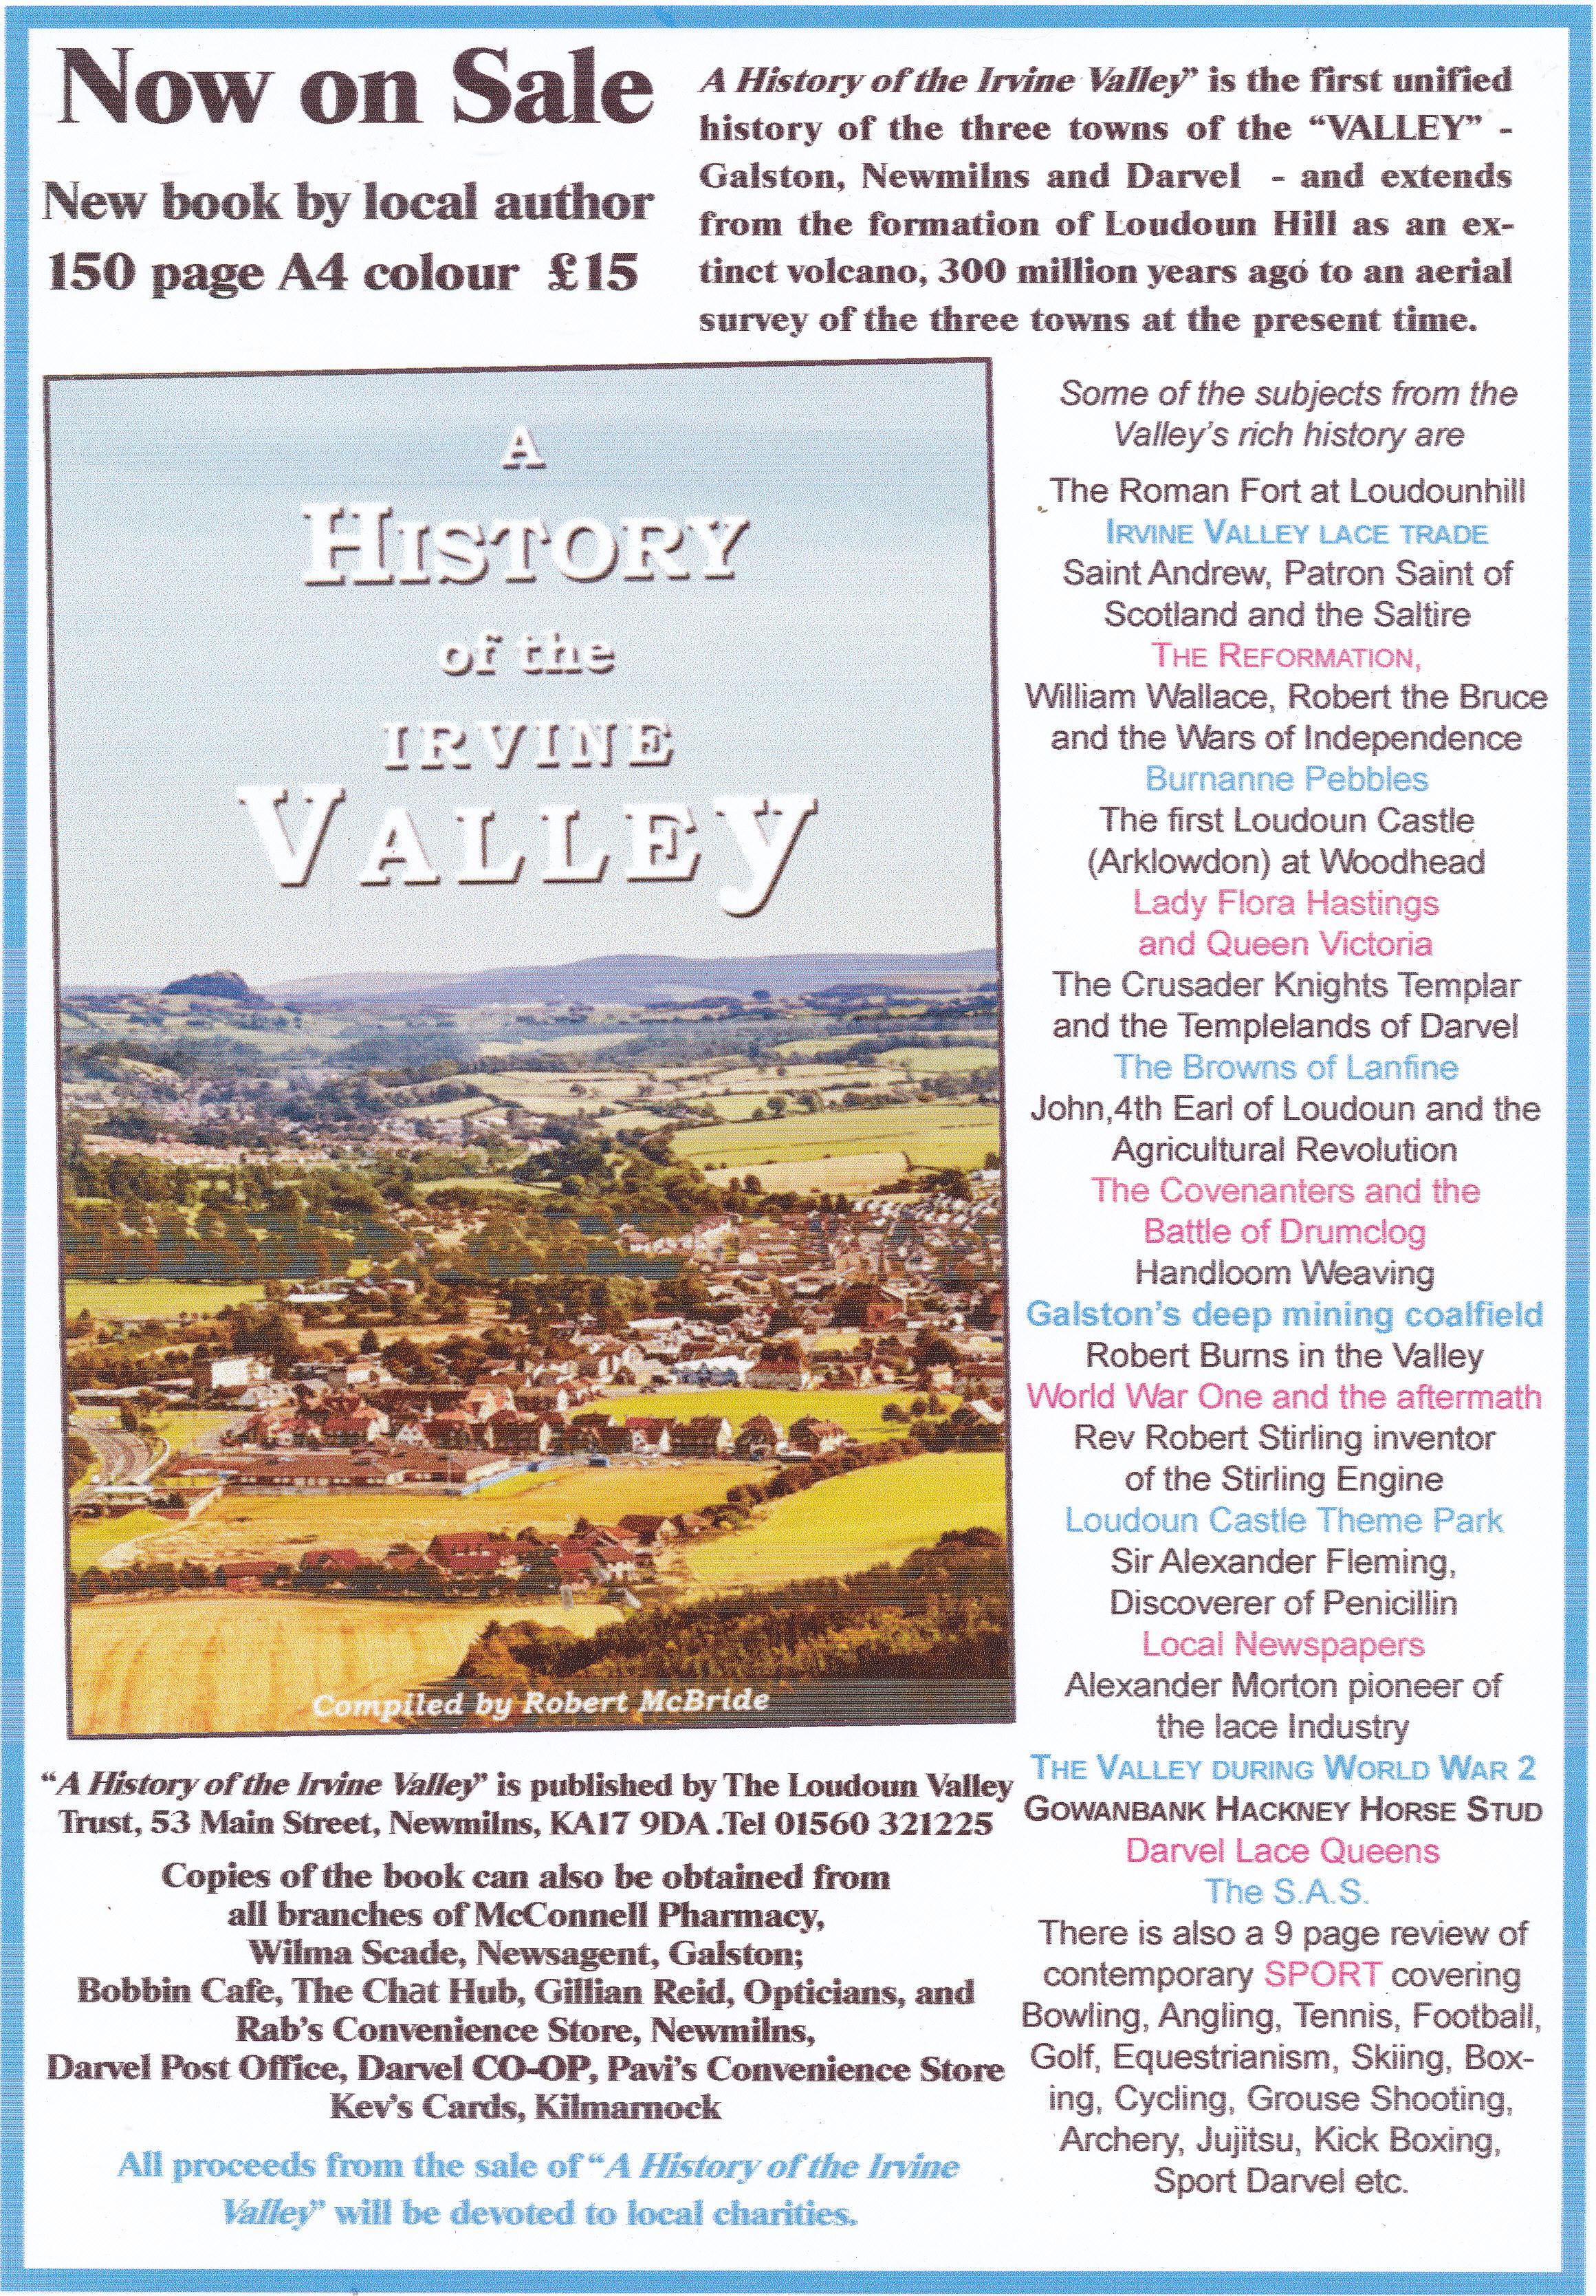 HistoryIrvineValley02